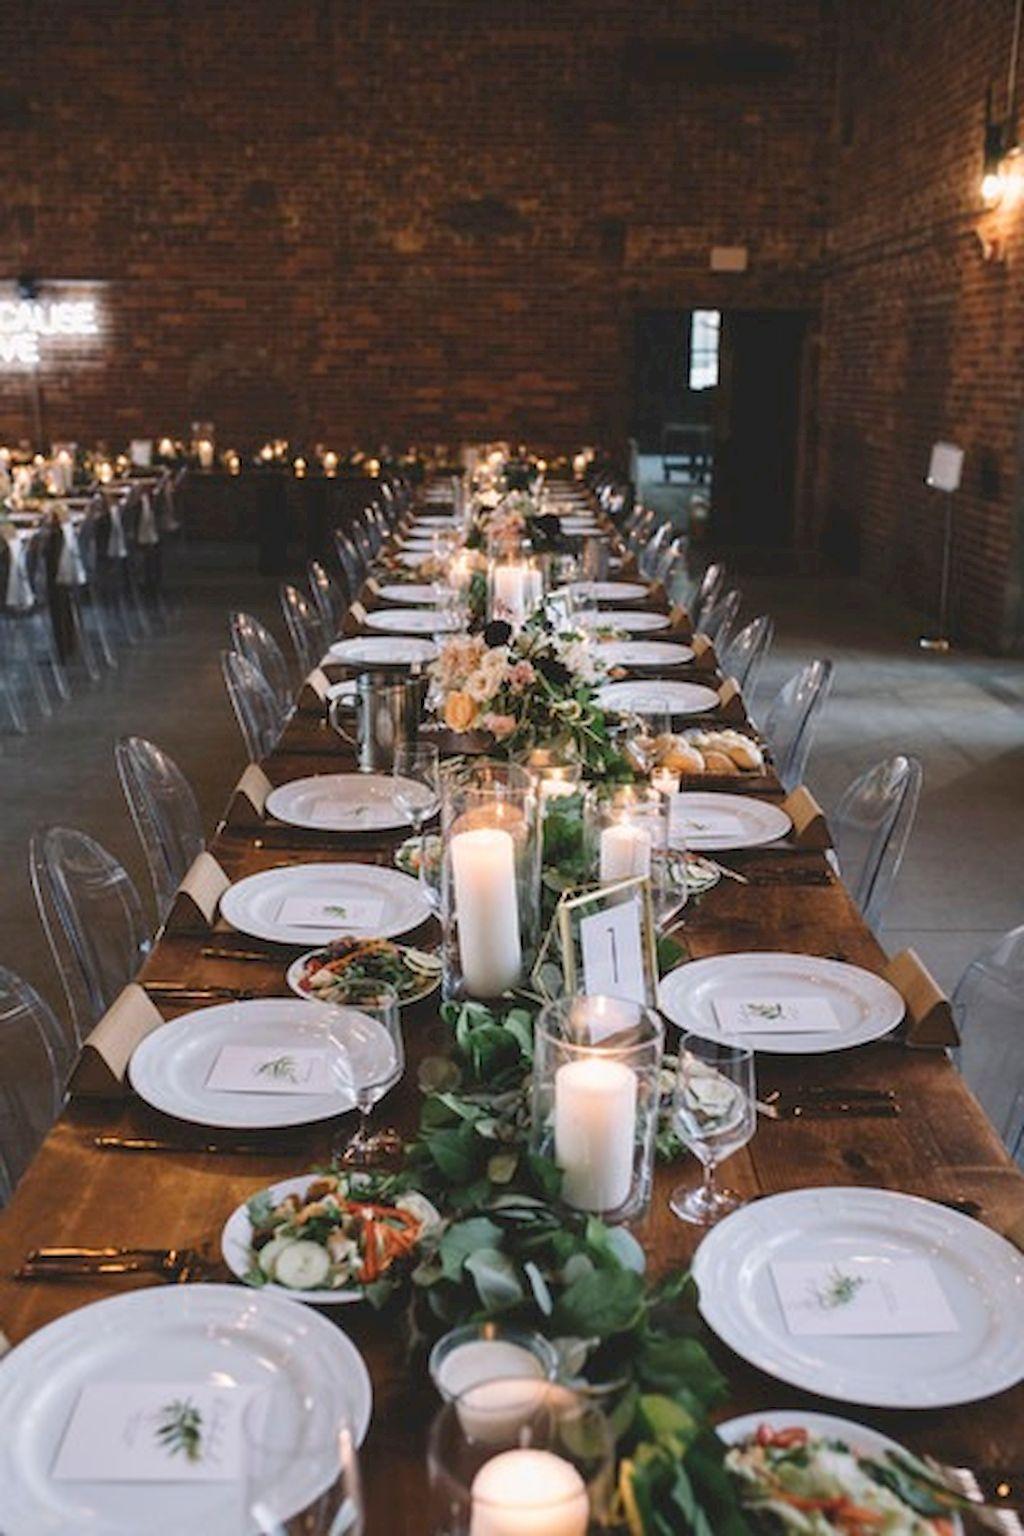 Wedding decor ideas simple   Simple Greenery Wedding Centerpieces Ideas  Wedding centerpieces